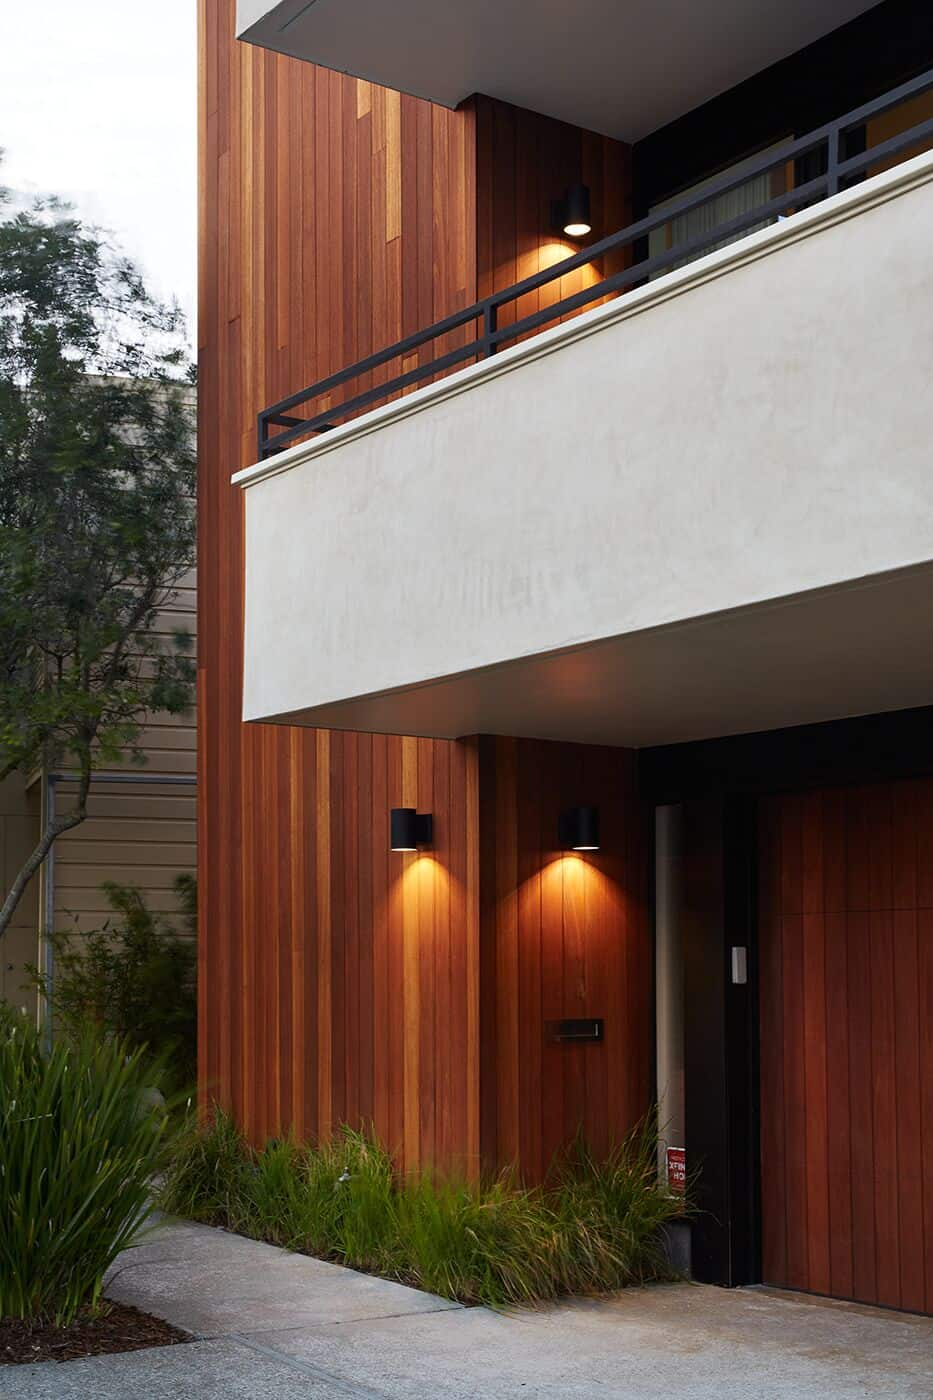 San Francisco Eichler Remodel-Klopf Architecture-02-1 Kindesign